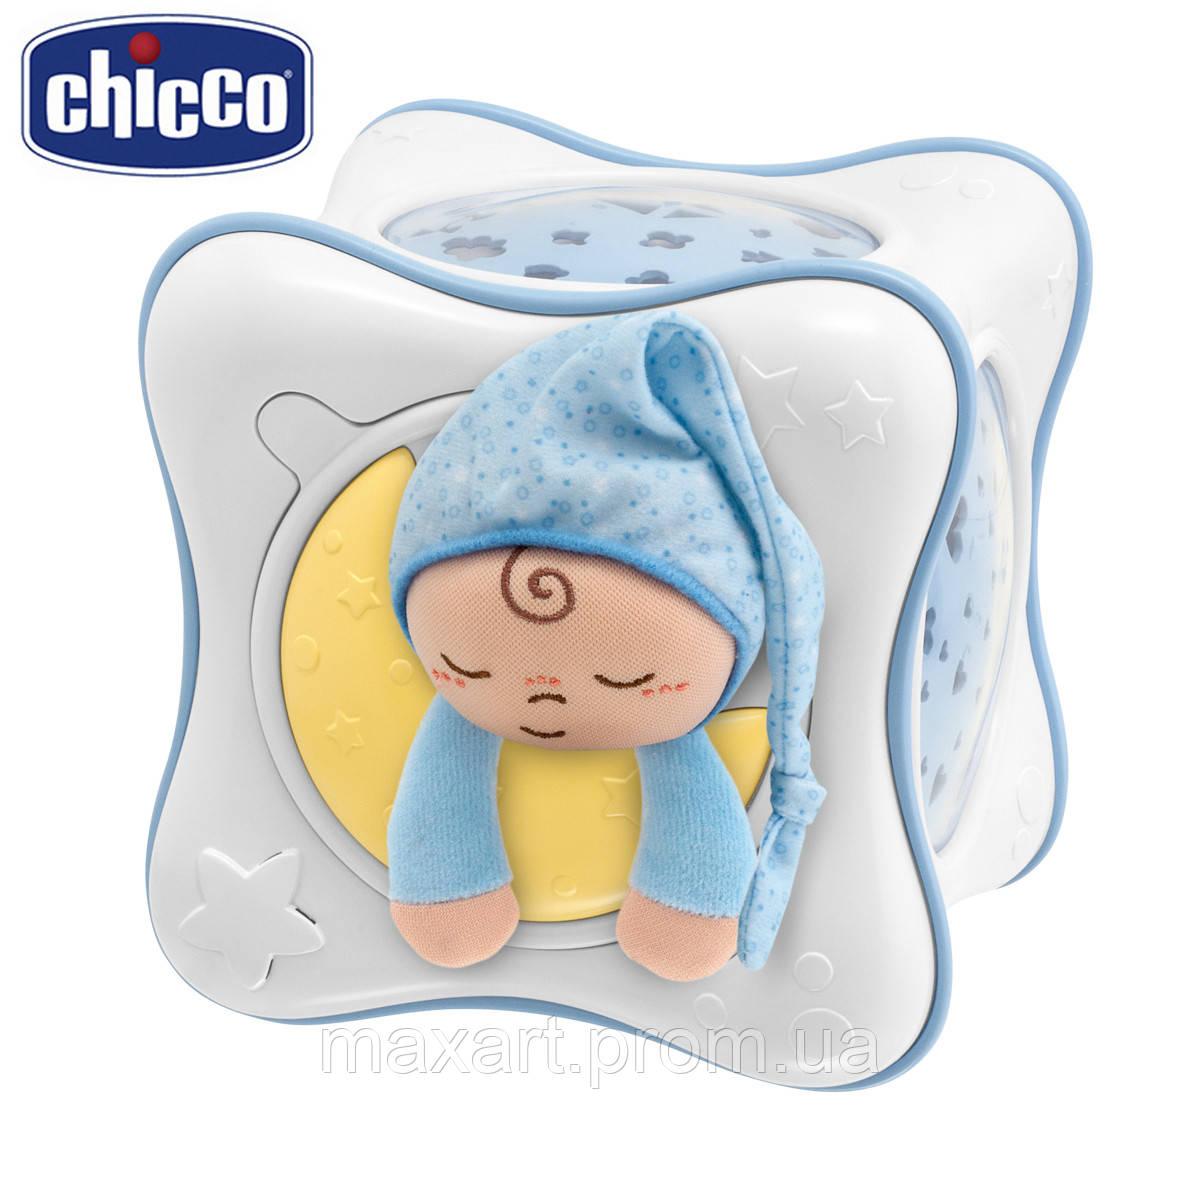 Проектор Chicco - Радуга (02430.20) голубой